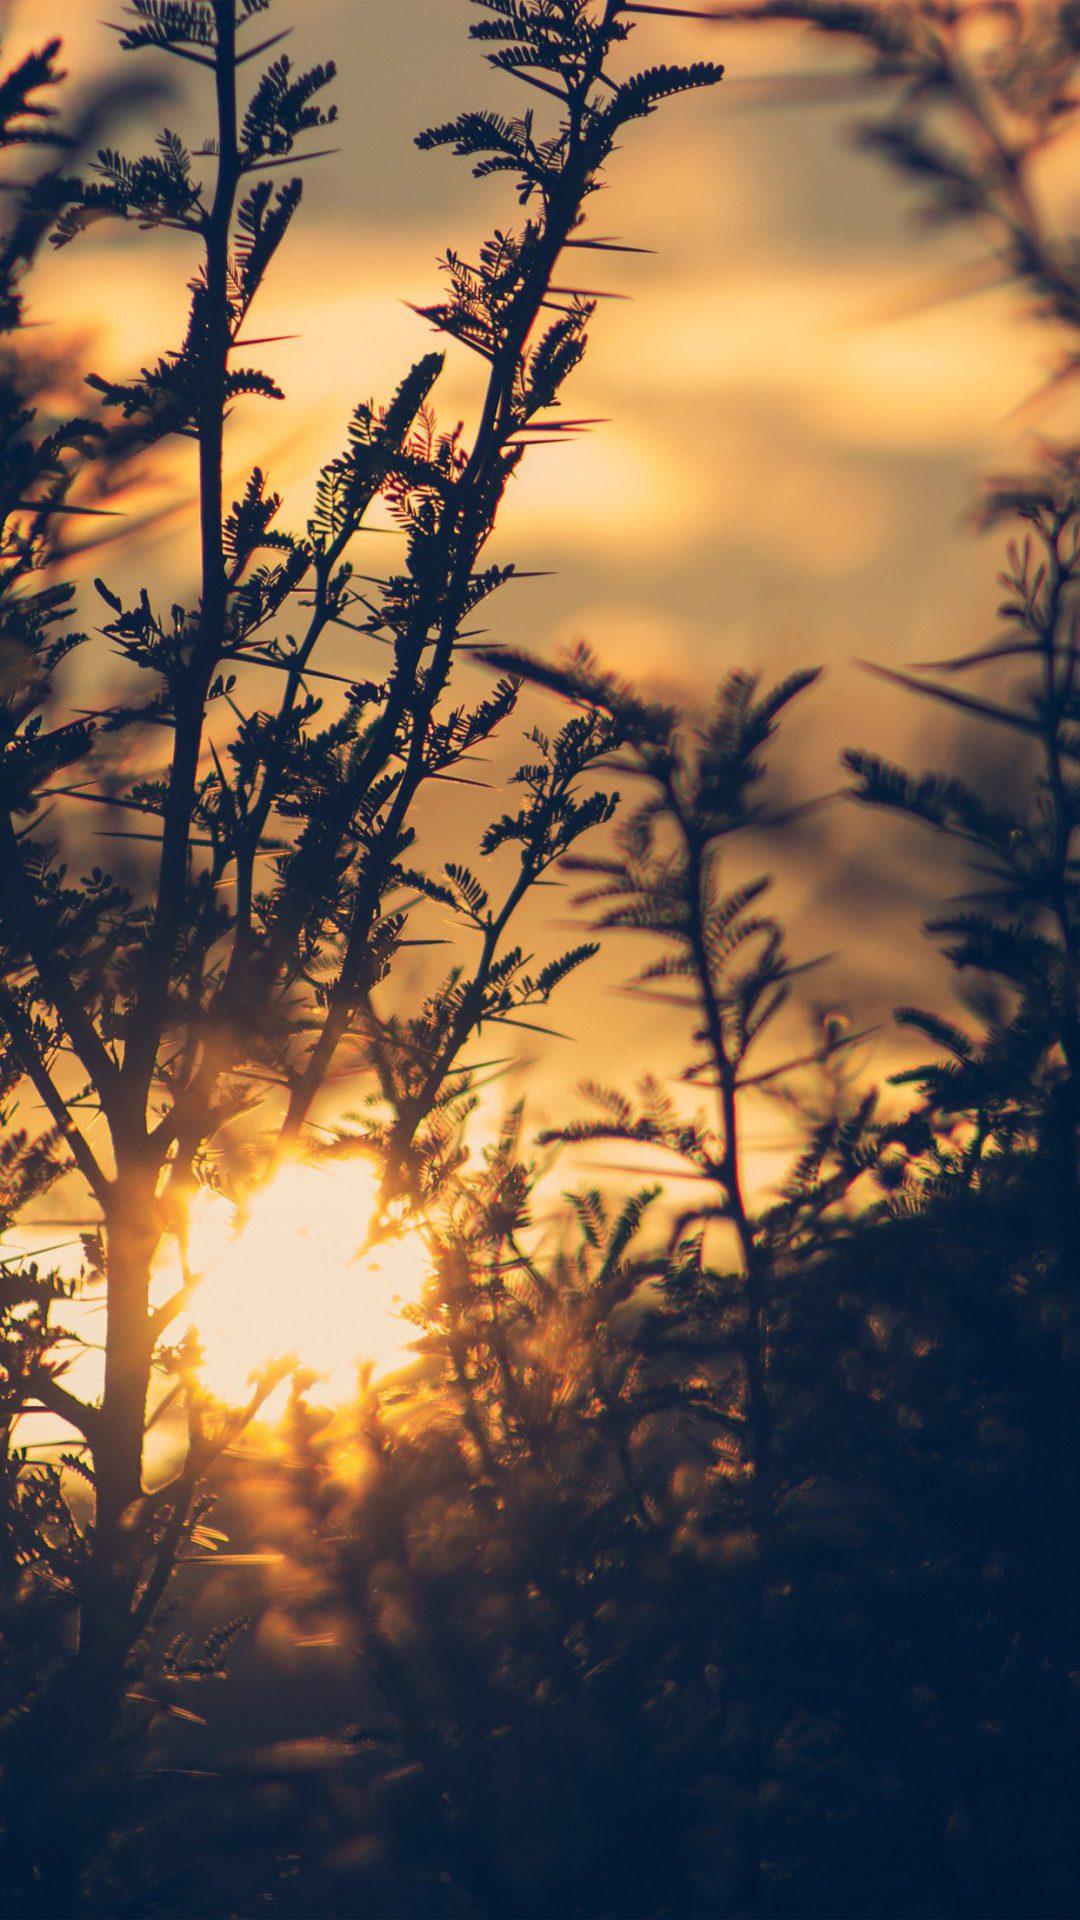 Sunset Tree Light Flare Bokeh Nature Photo